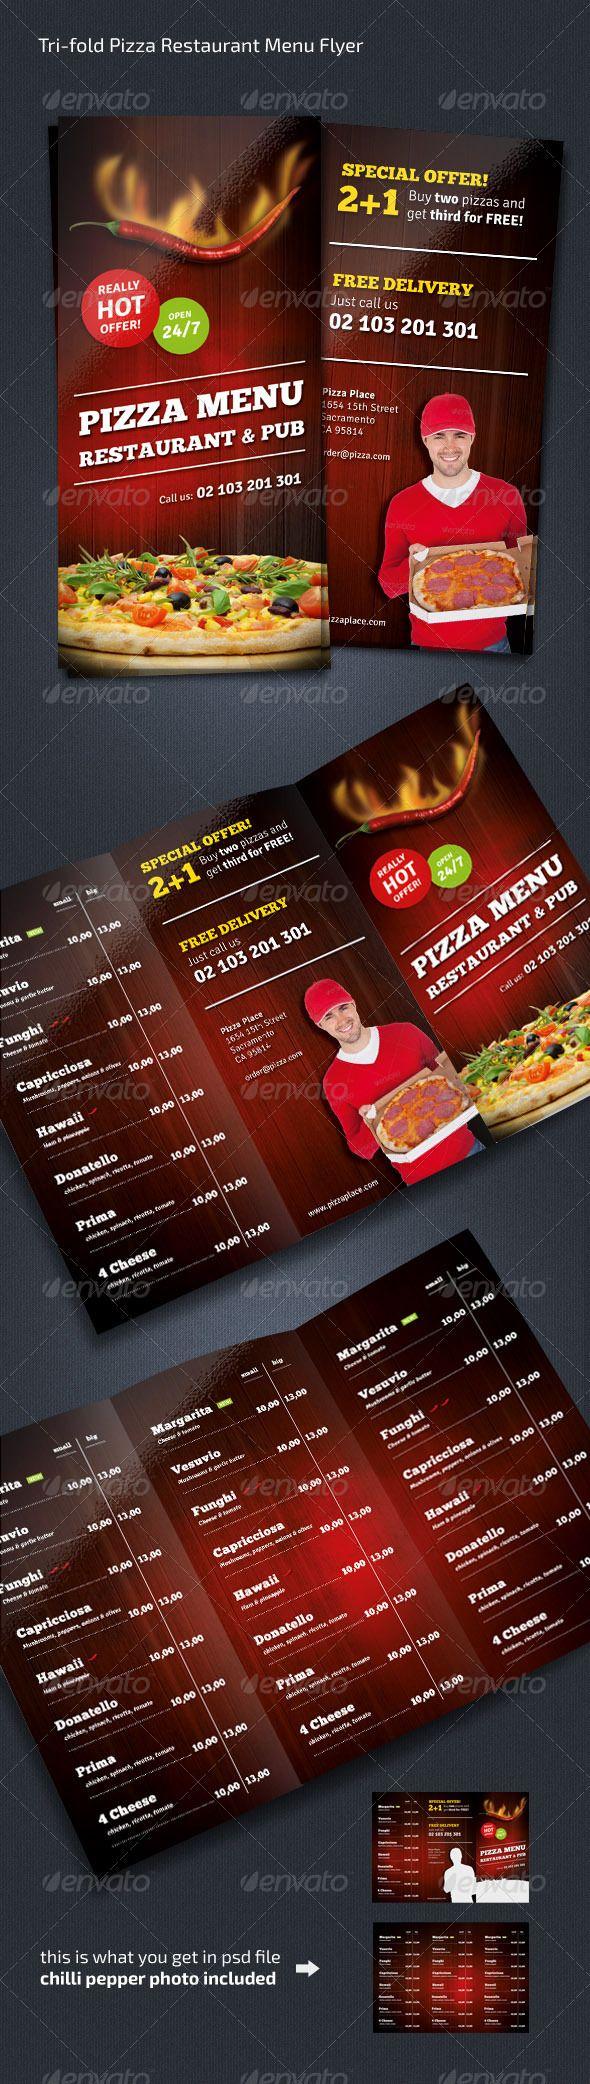 Pizza Restaurant Menu Flyer (Trifold) - Restaurant Flyers